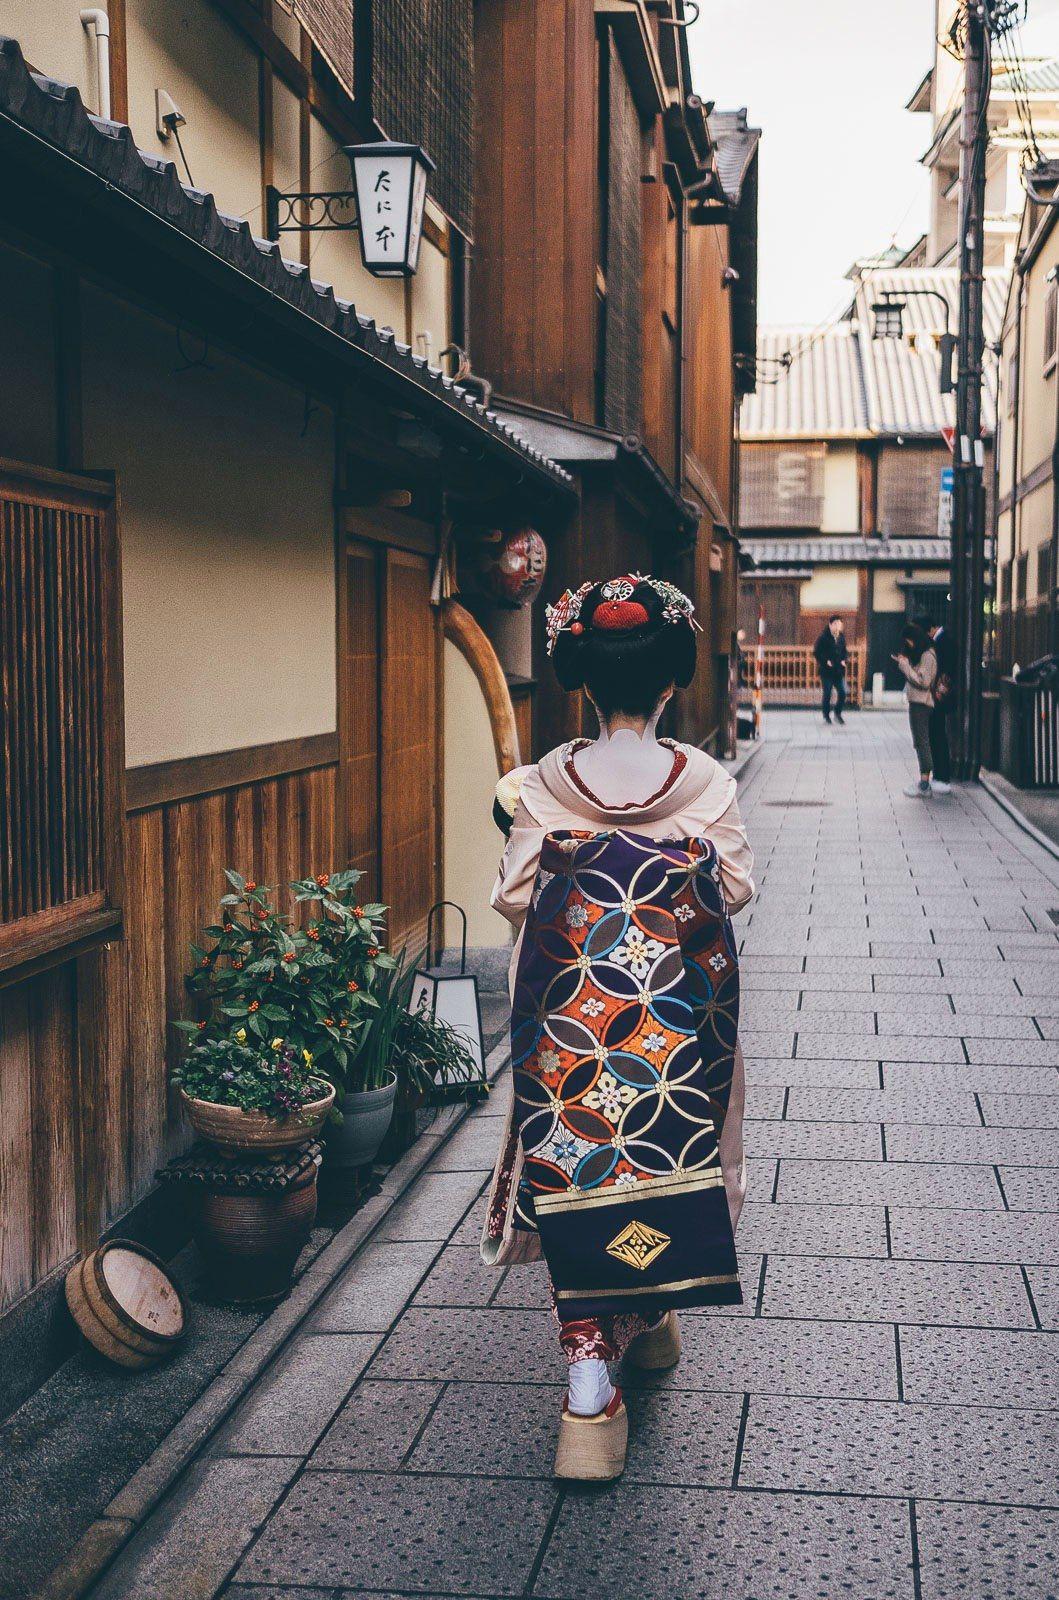 Hanamikoji Dori, Киото, Япония